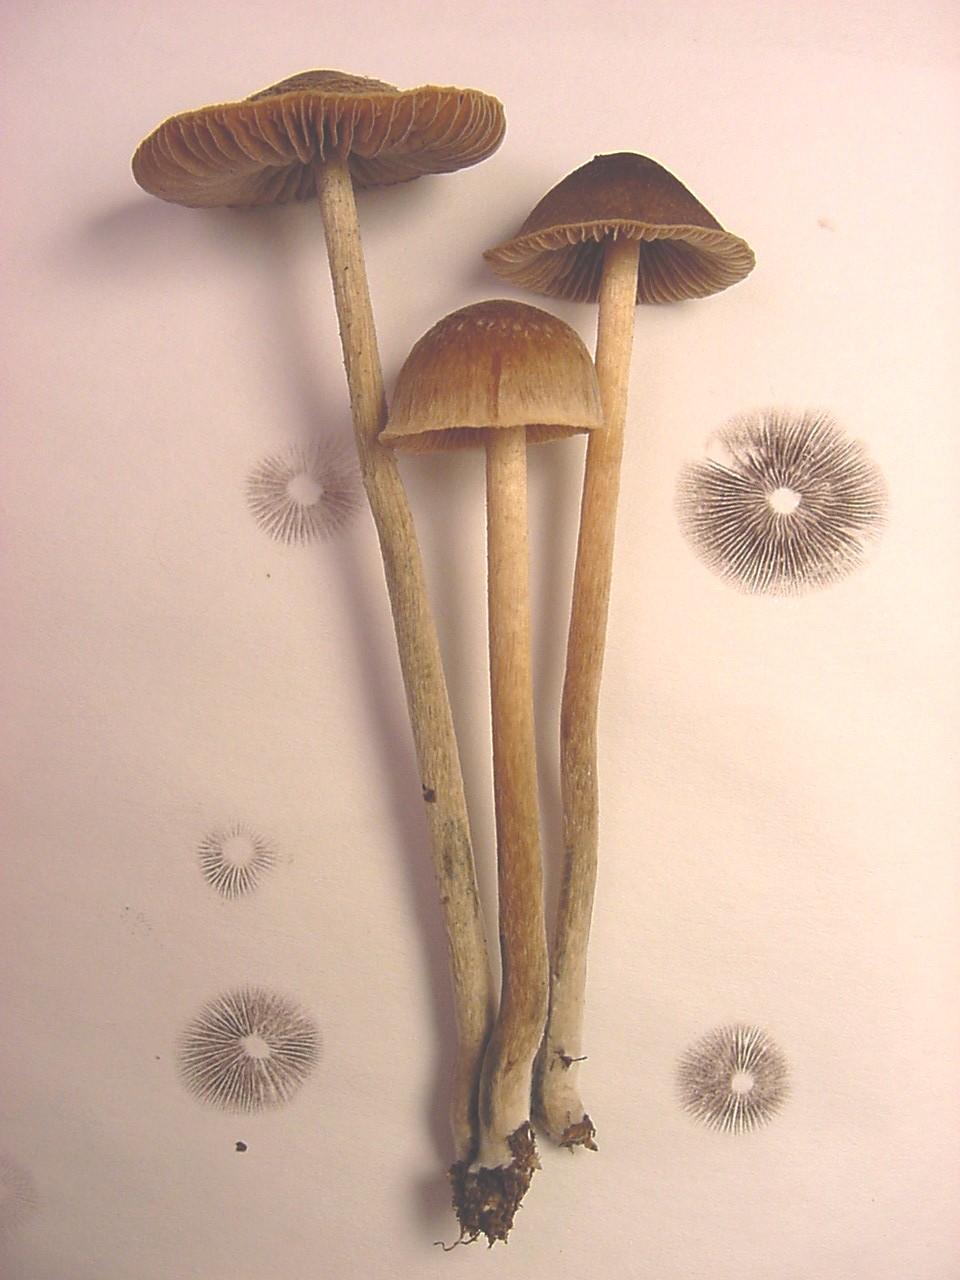 decorative display of psilocybe mushrooms, pink background with black cap prints